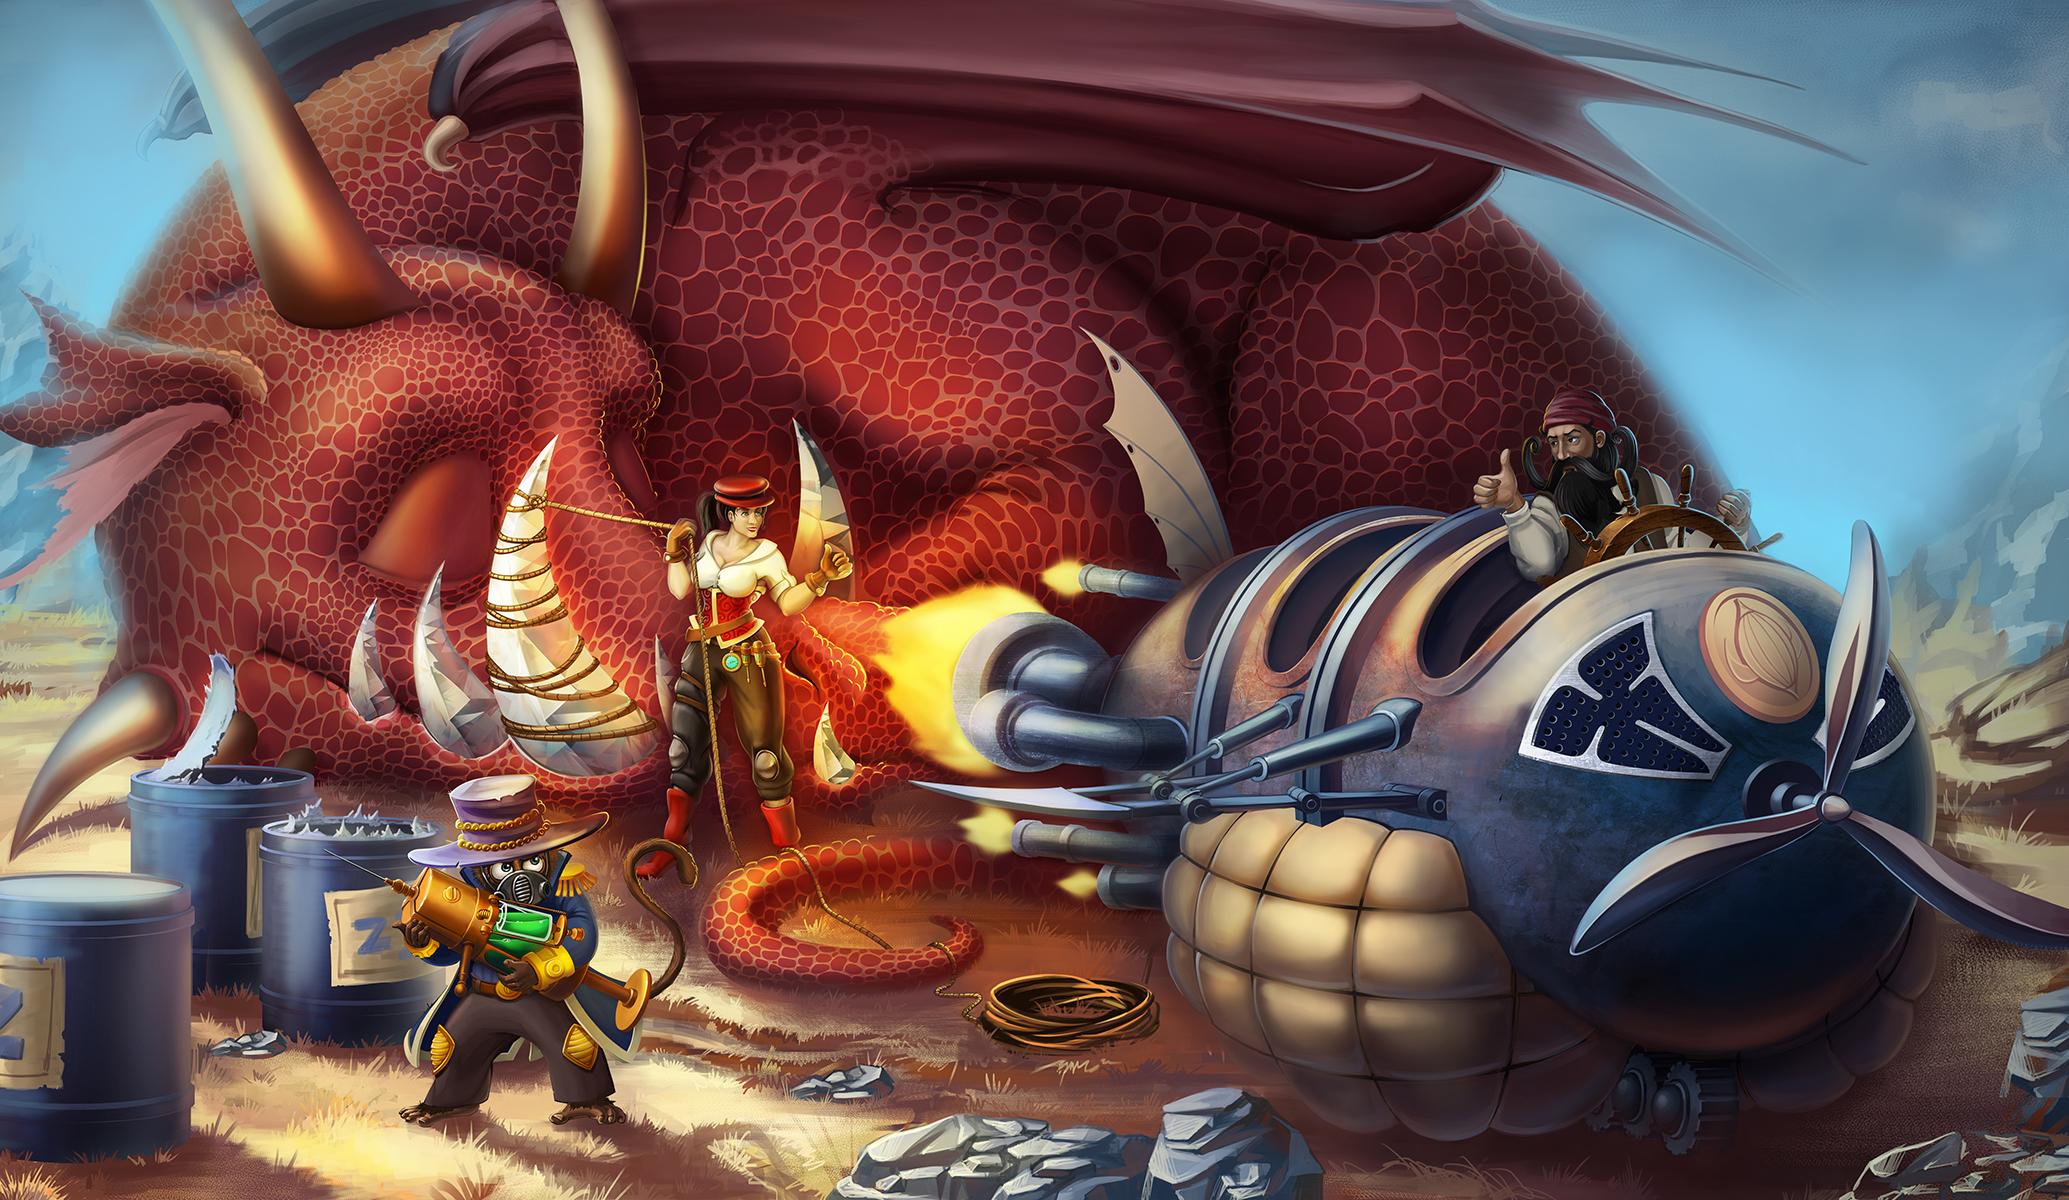 Treasure_hunters_11.jpg